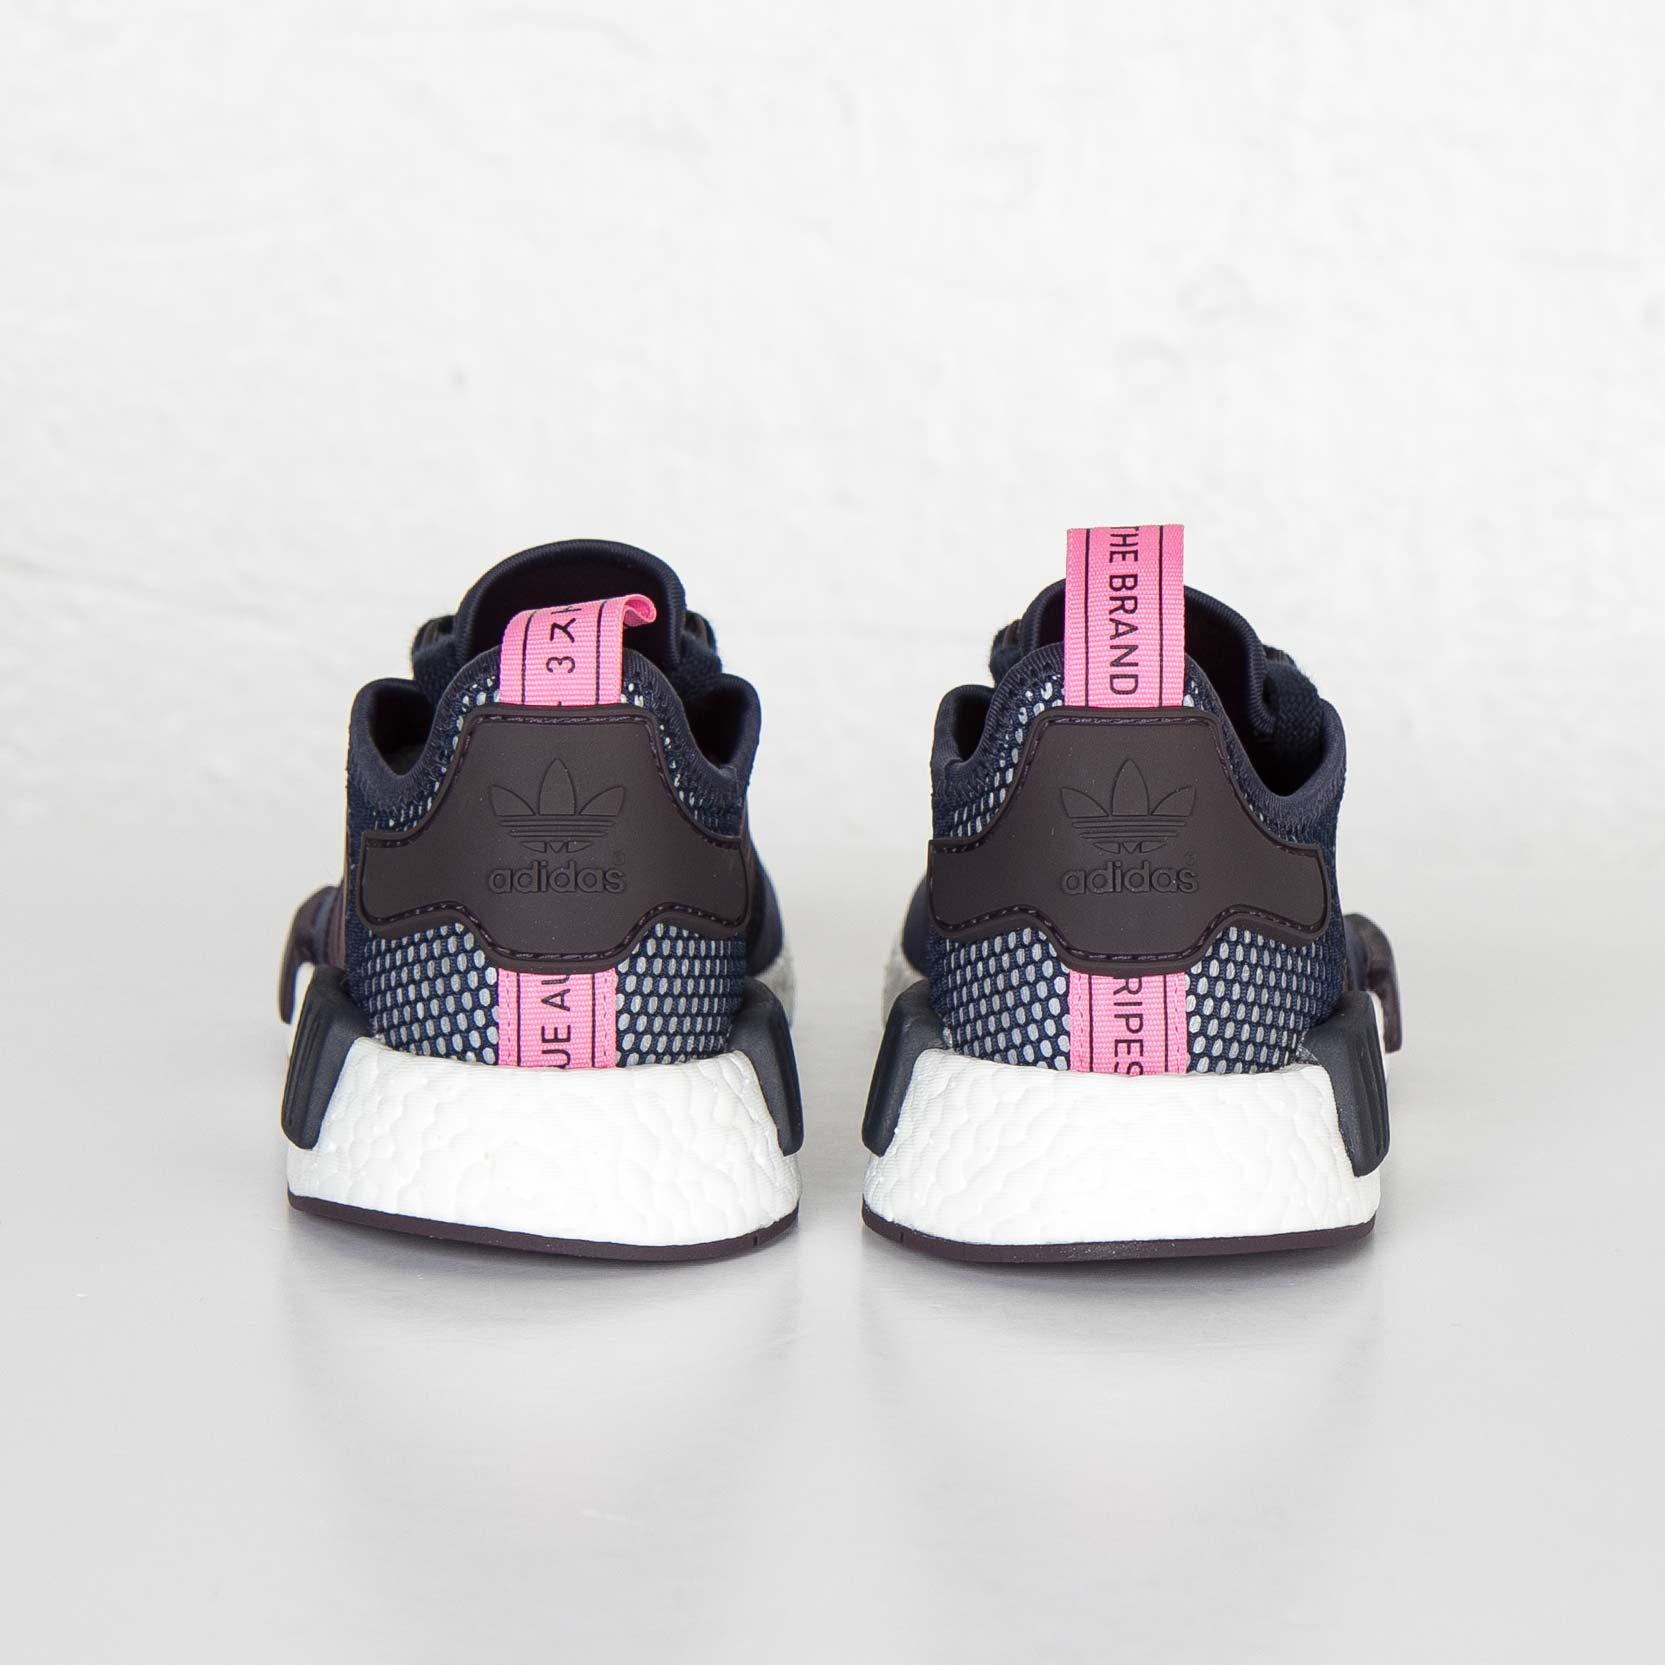 adidas nmd runner legend ink mineral